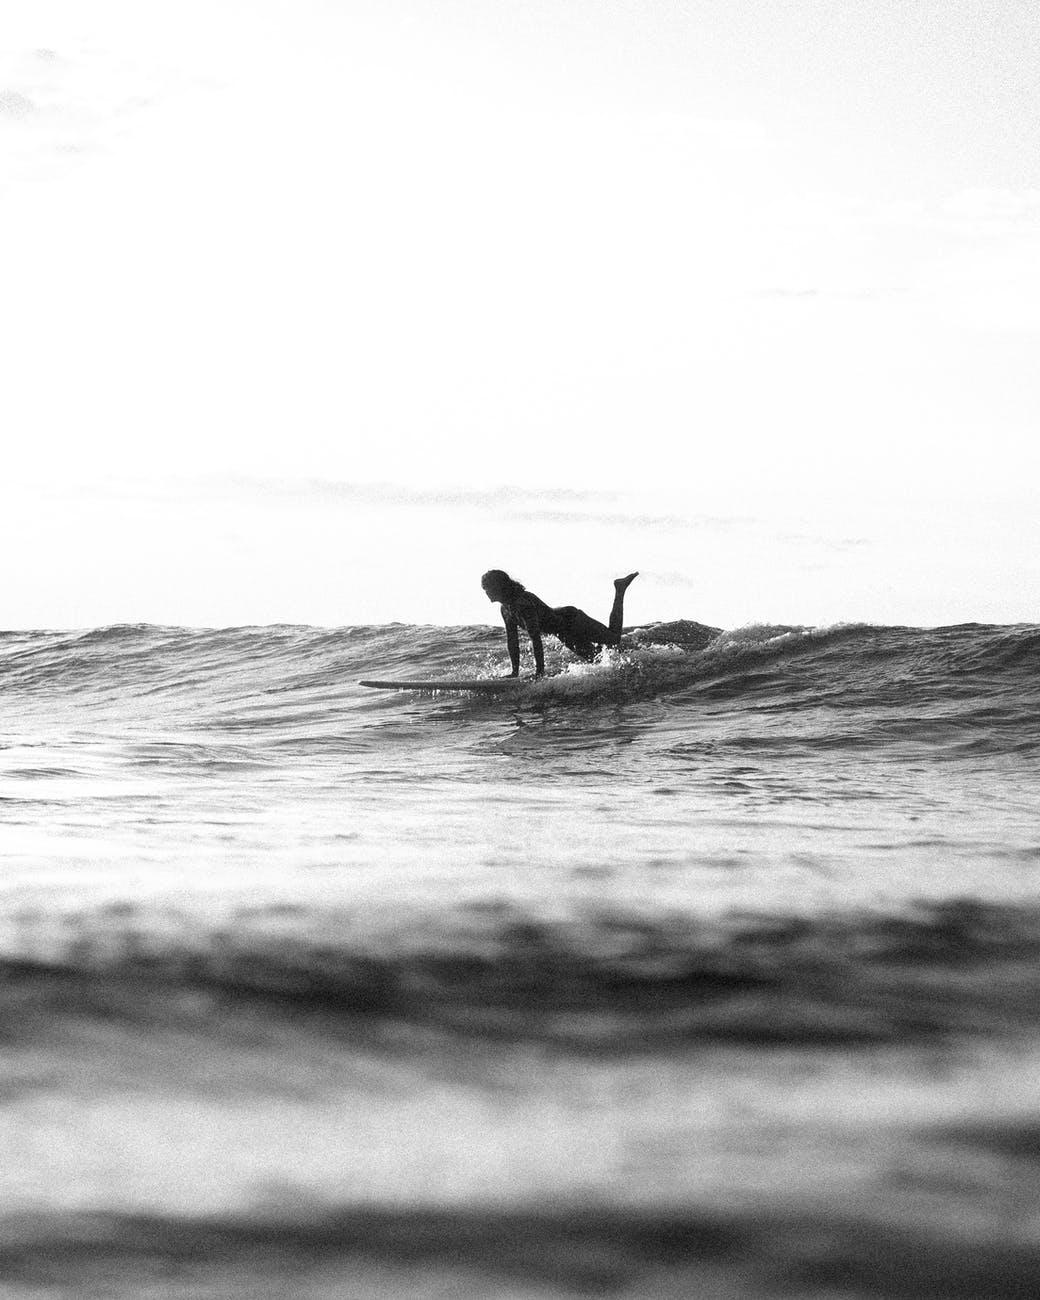 silhouette of woman on surfboard in water